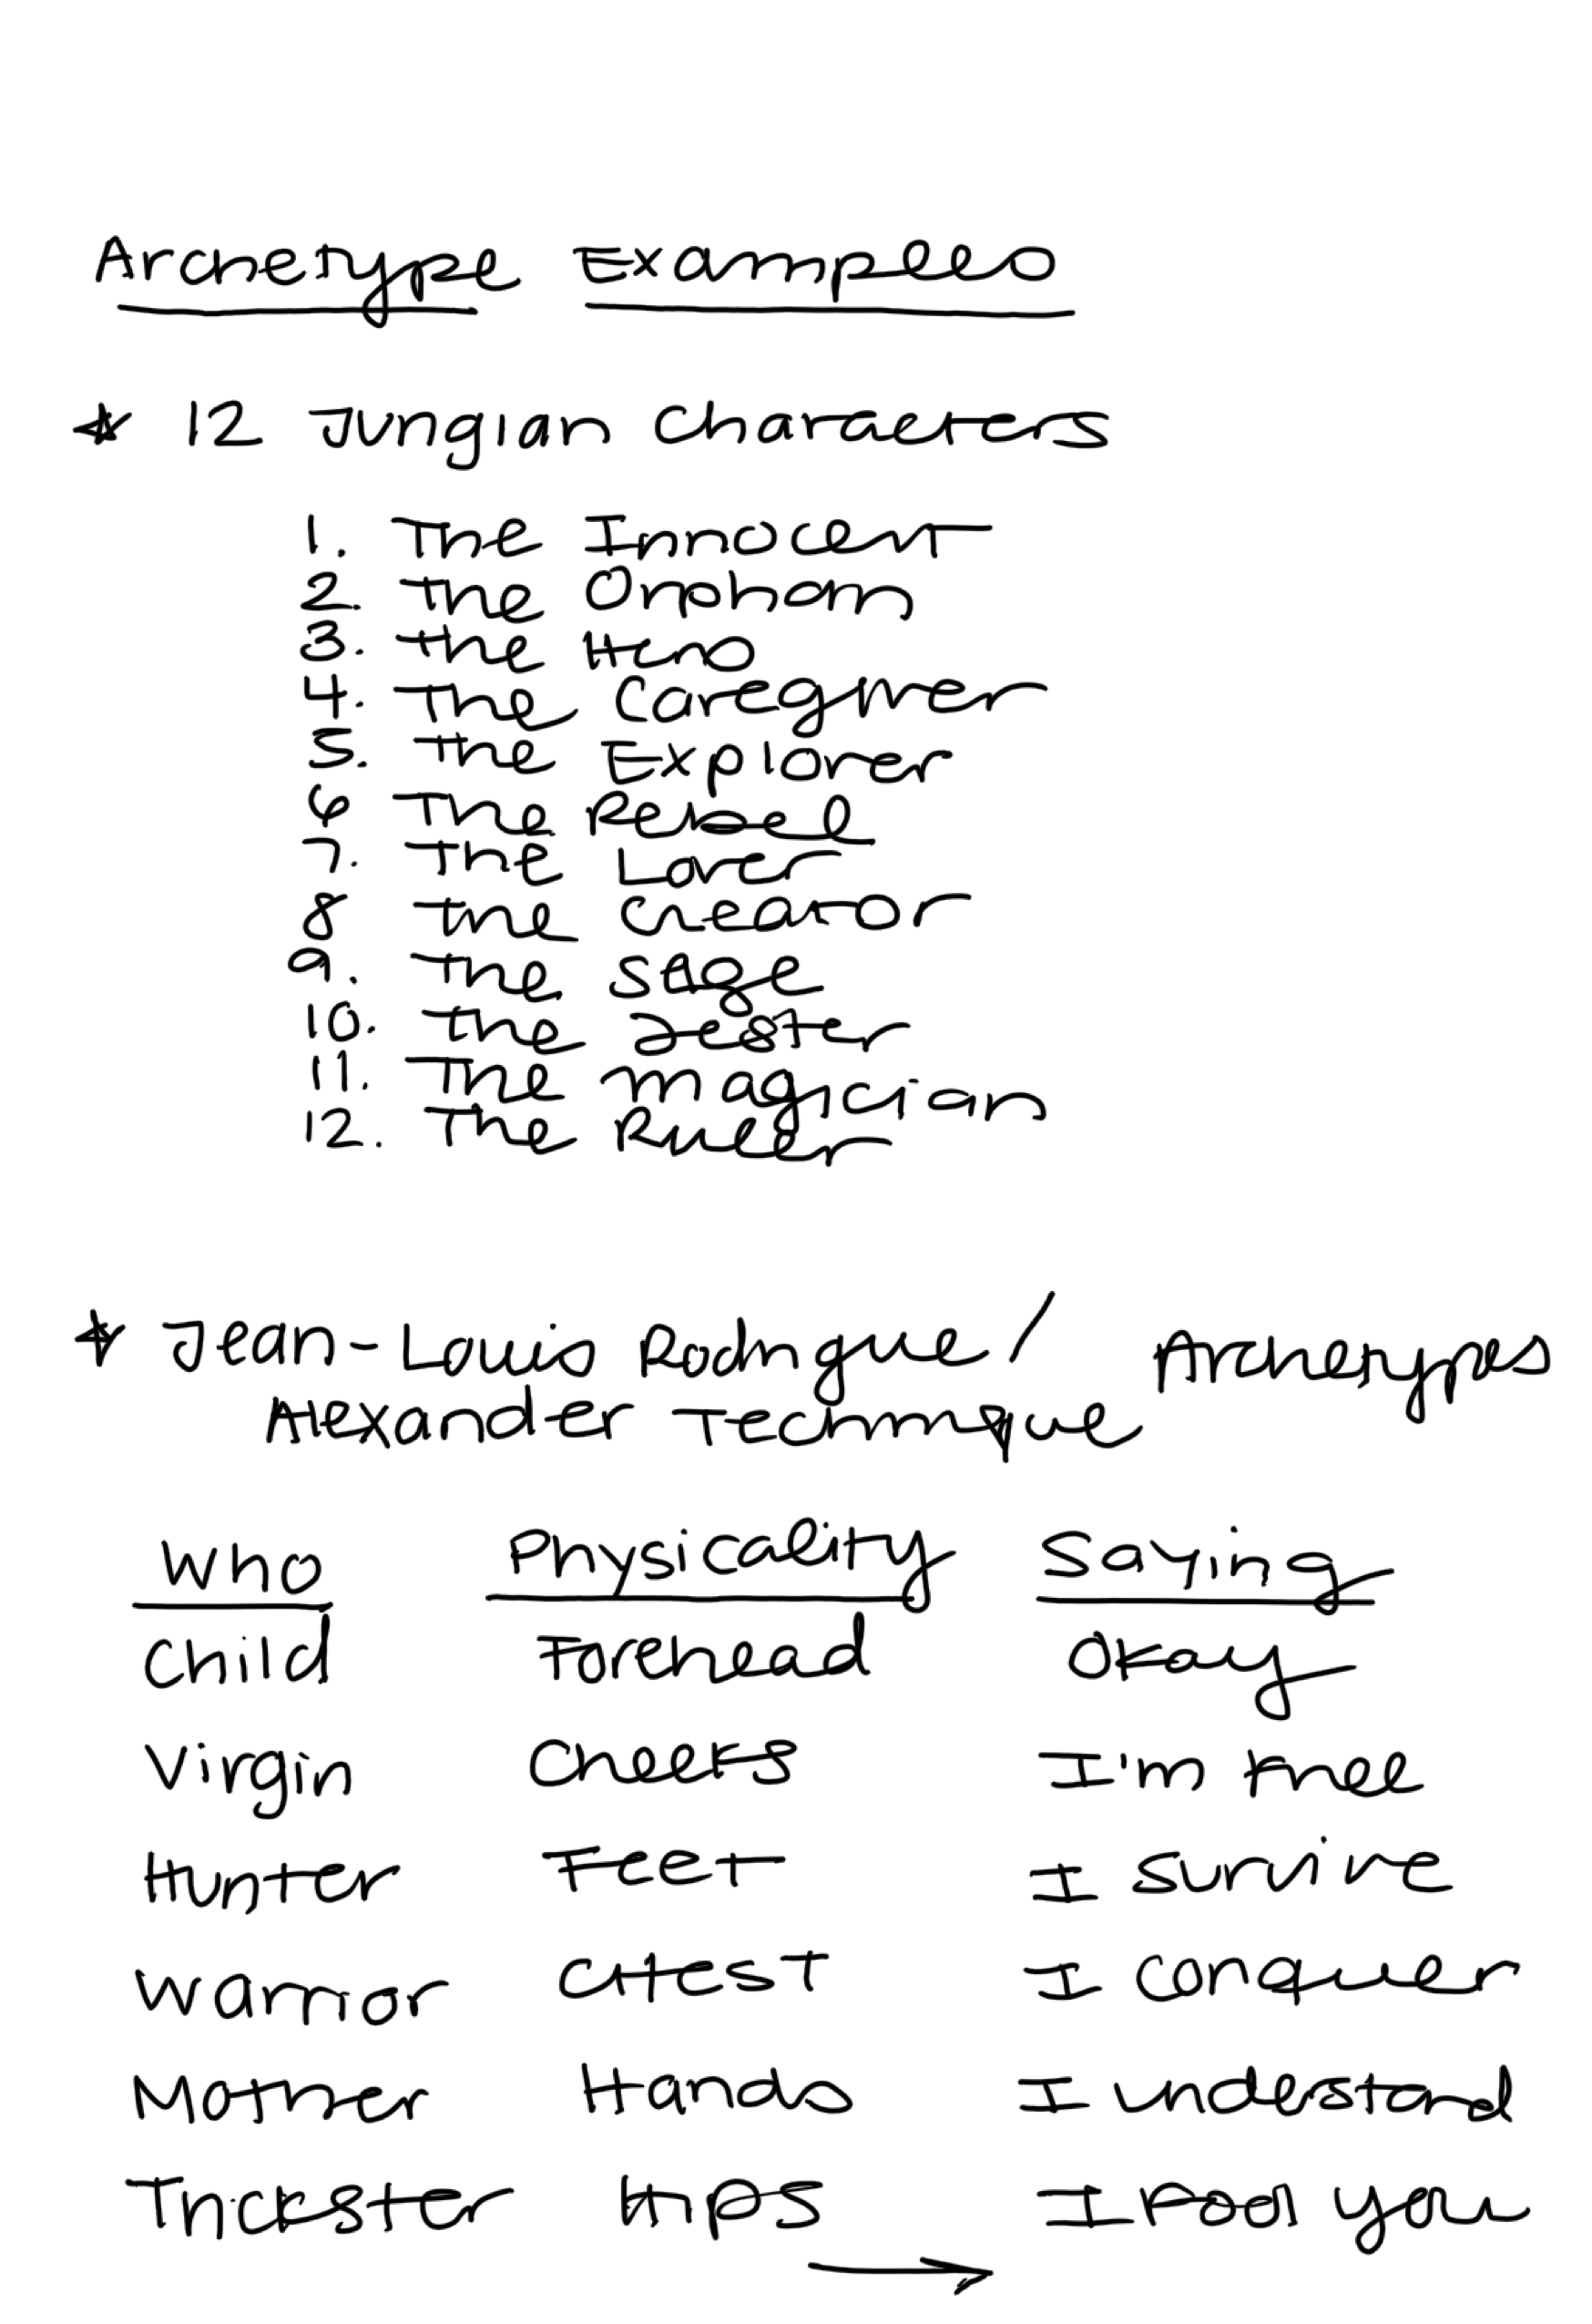 WCM0017.png